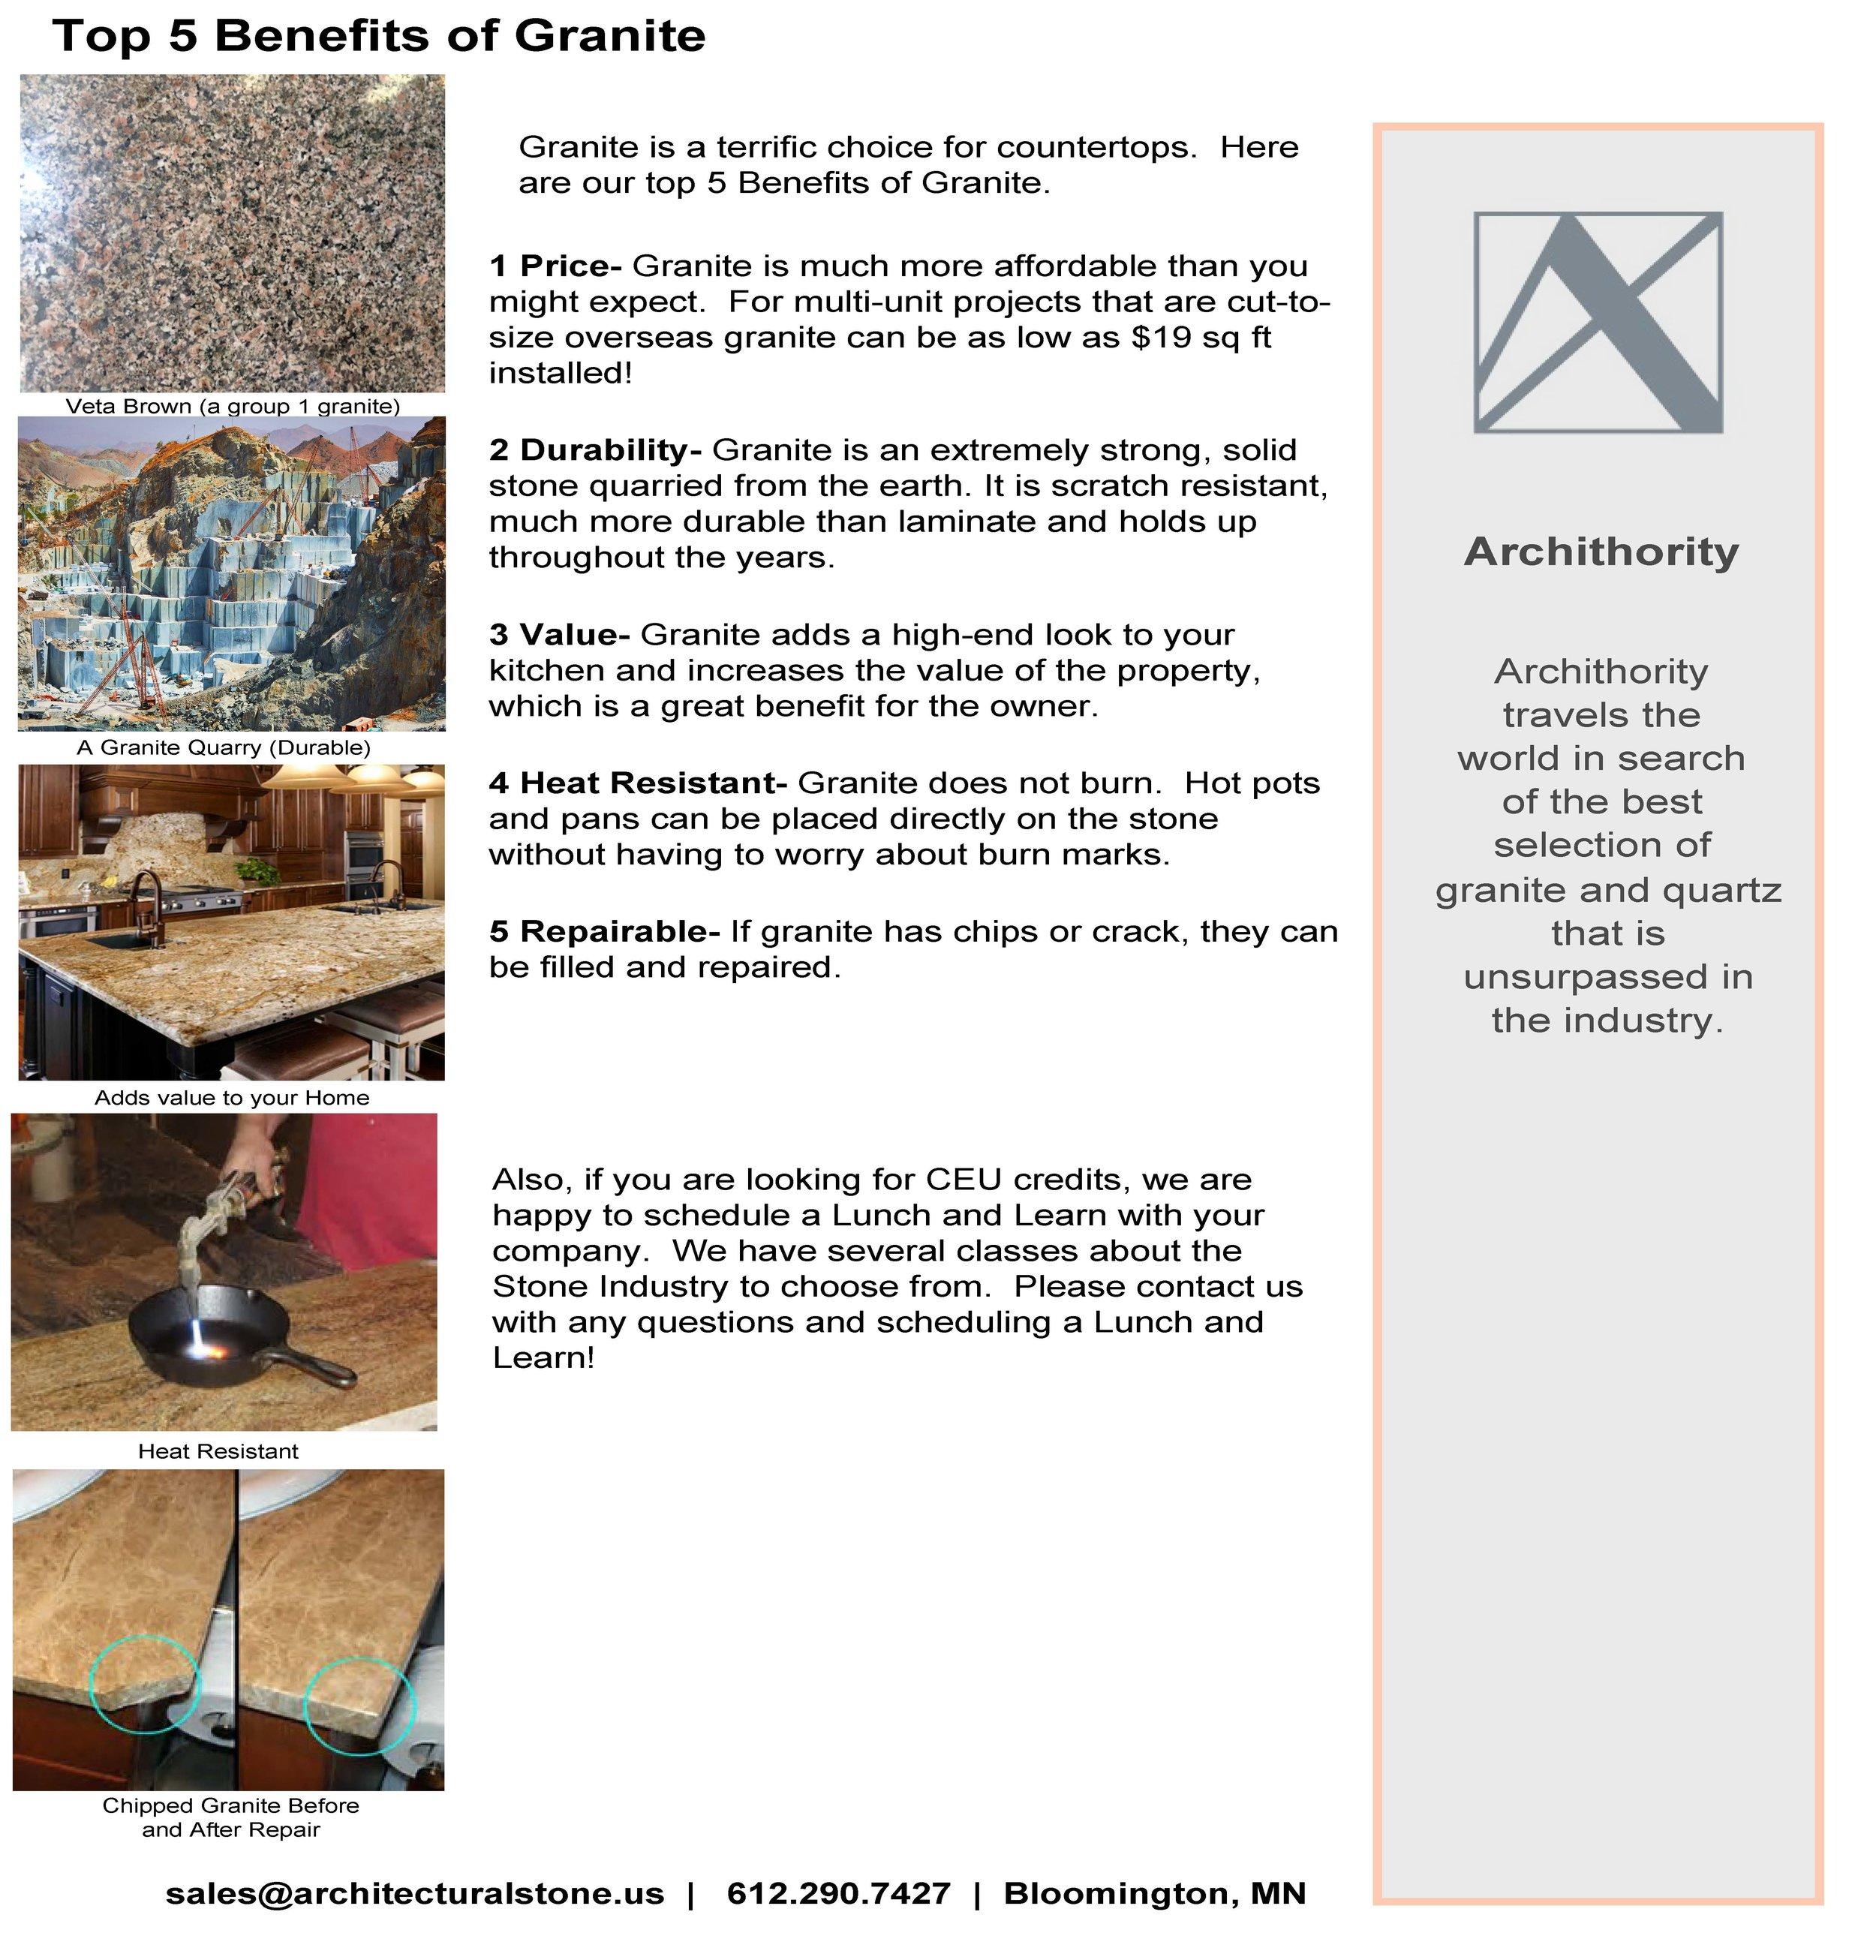 Top 5 Benefits of Granite.jpg